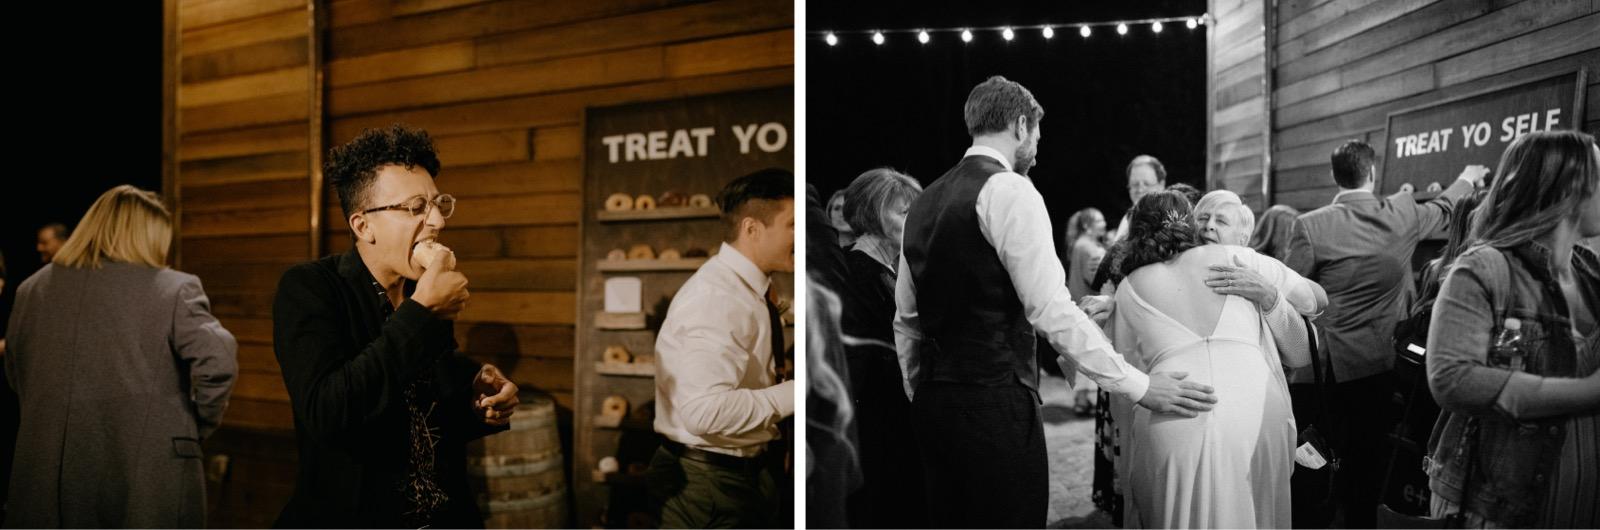 131_Emily & Jeff Wedding 1118_Emily & Jeff Wedding 1117_the-waterfall-lodge_forest_wedding_ben-lomond_intimate